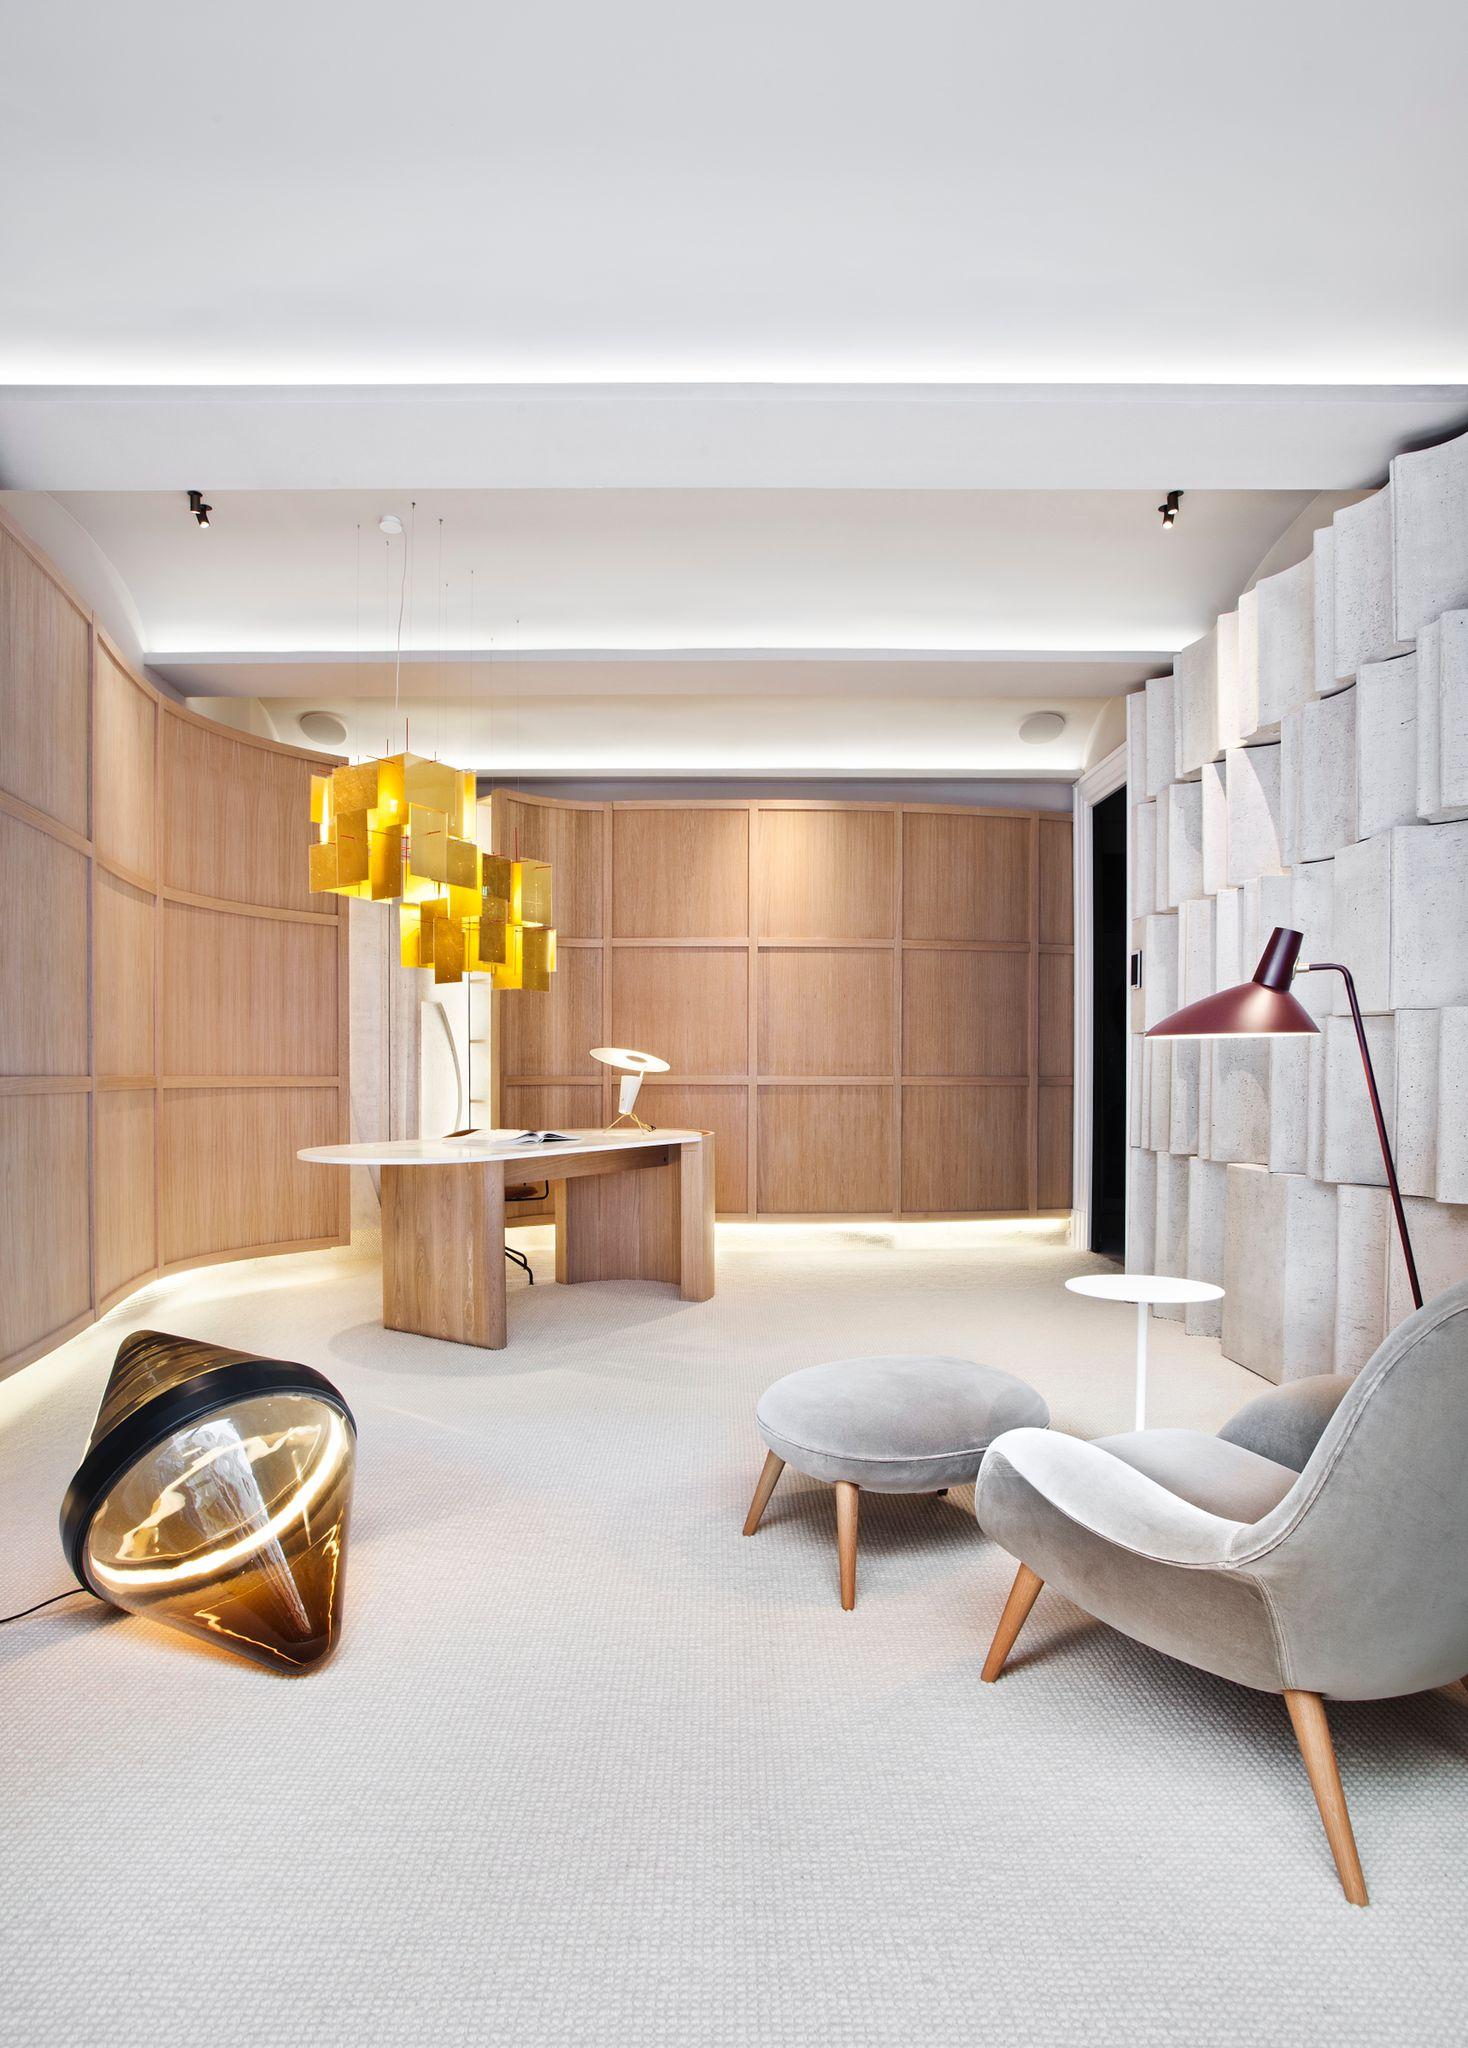 Moderns Time de The Room Studio